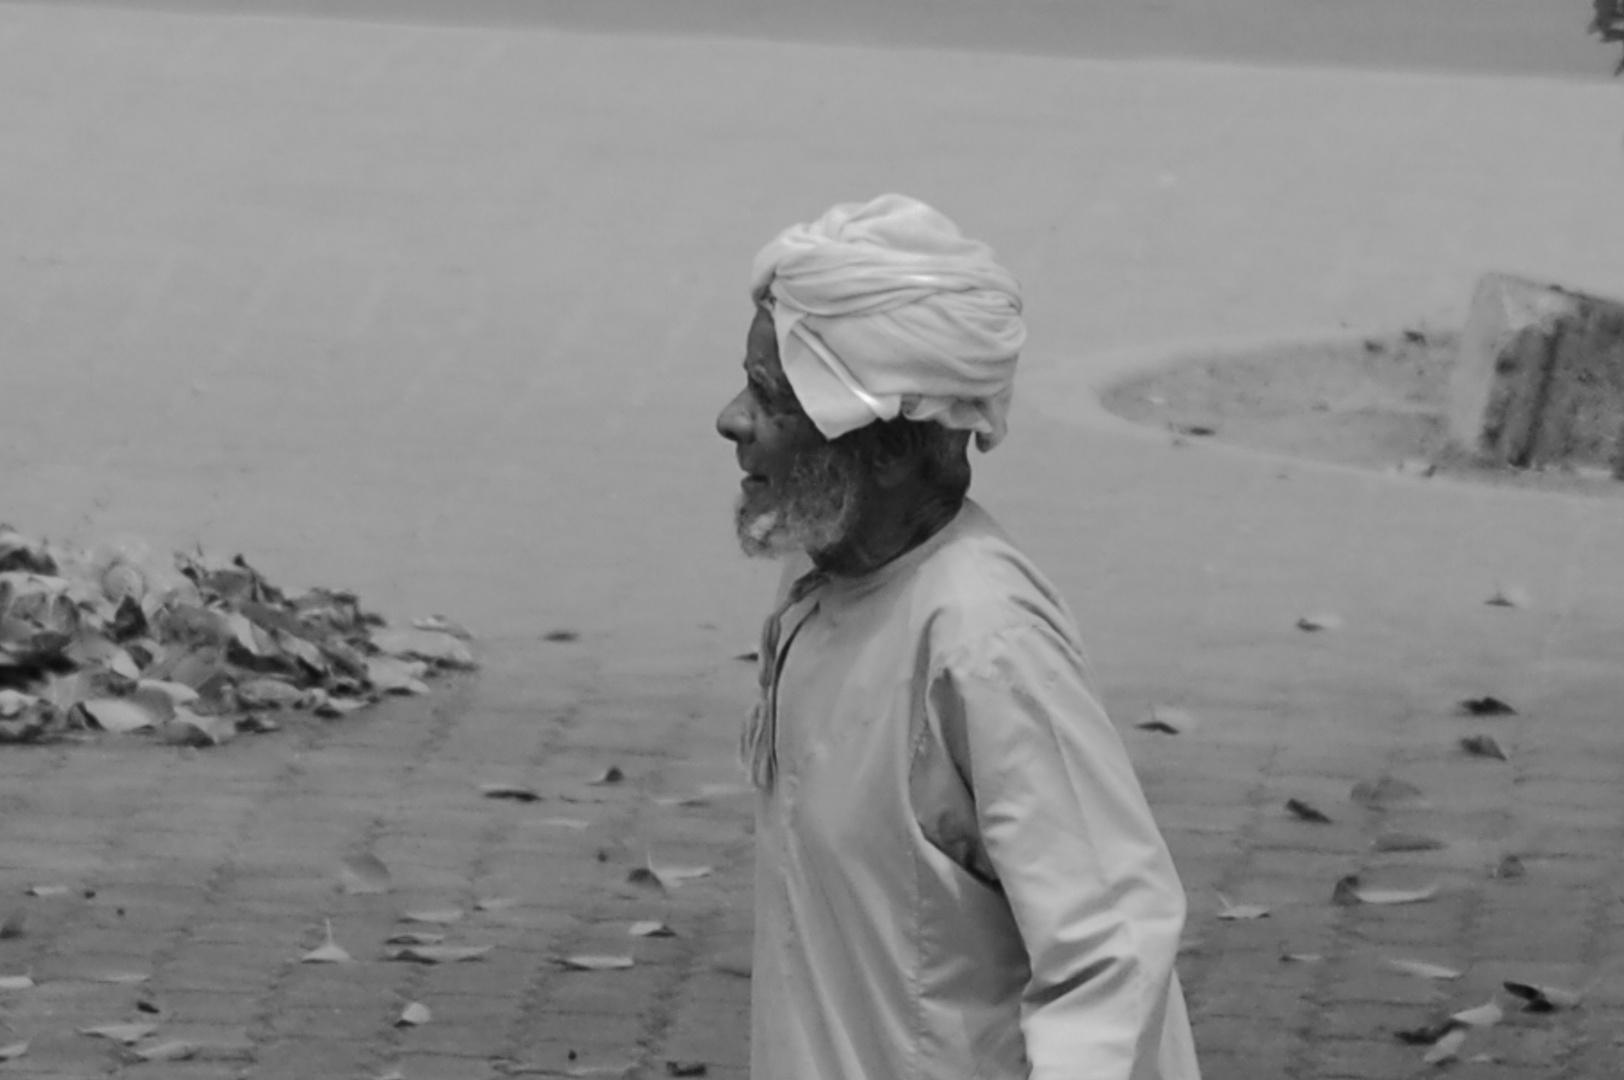 Old Man in Oman